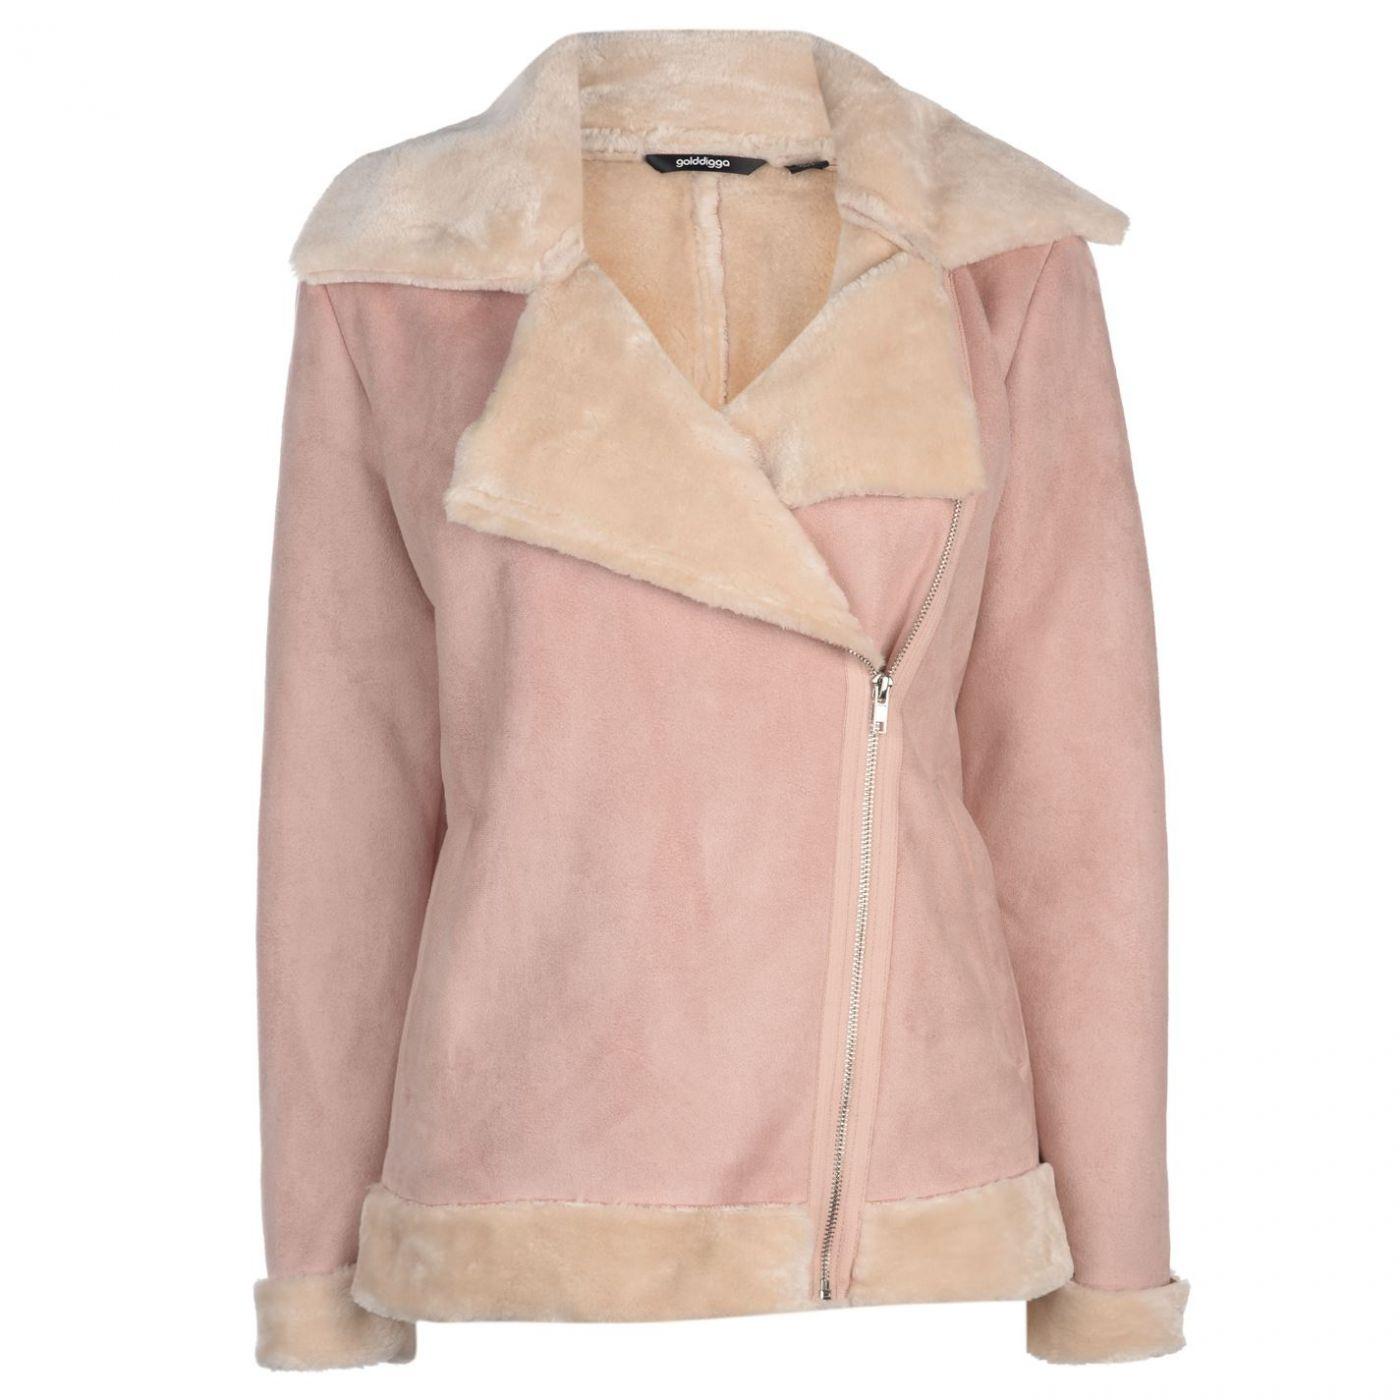 Golddigga Faux Fur Aviator Jacket Ladies